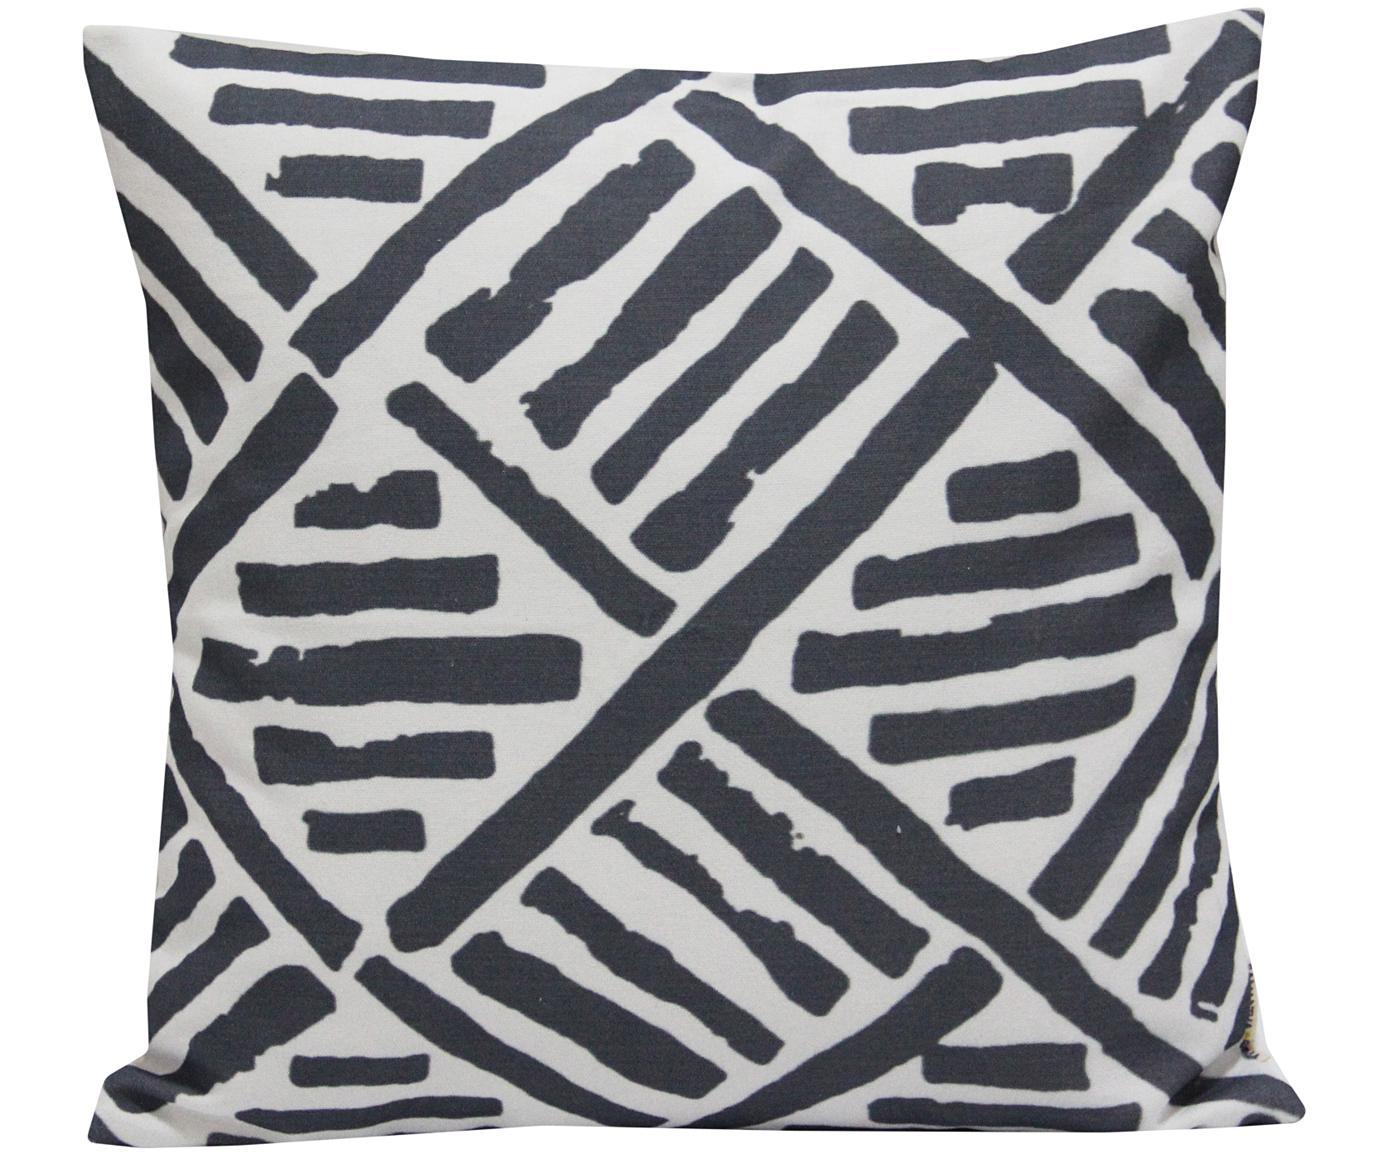 Poszewka na poduszkę Len, Bawełna, Biały, czarny, S 45 x D 45 cm